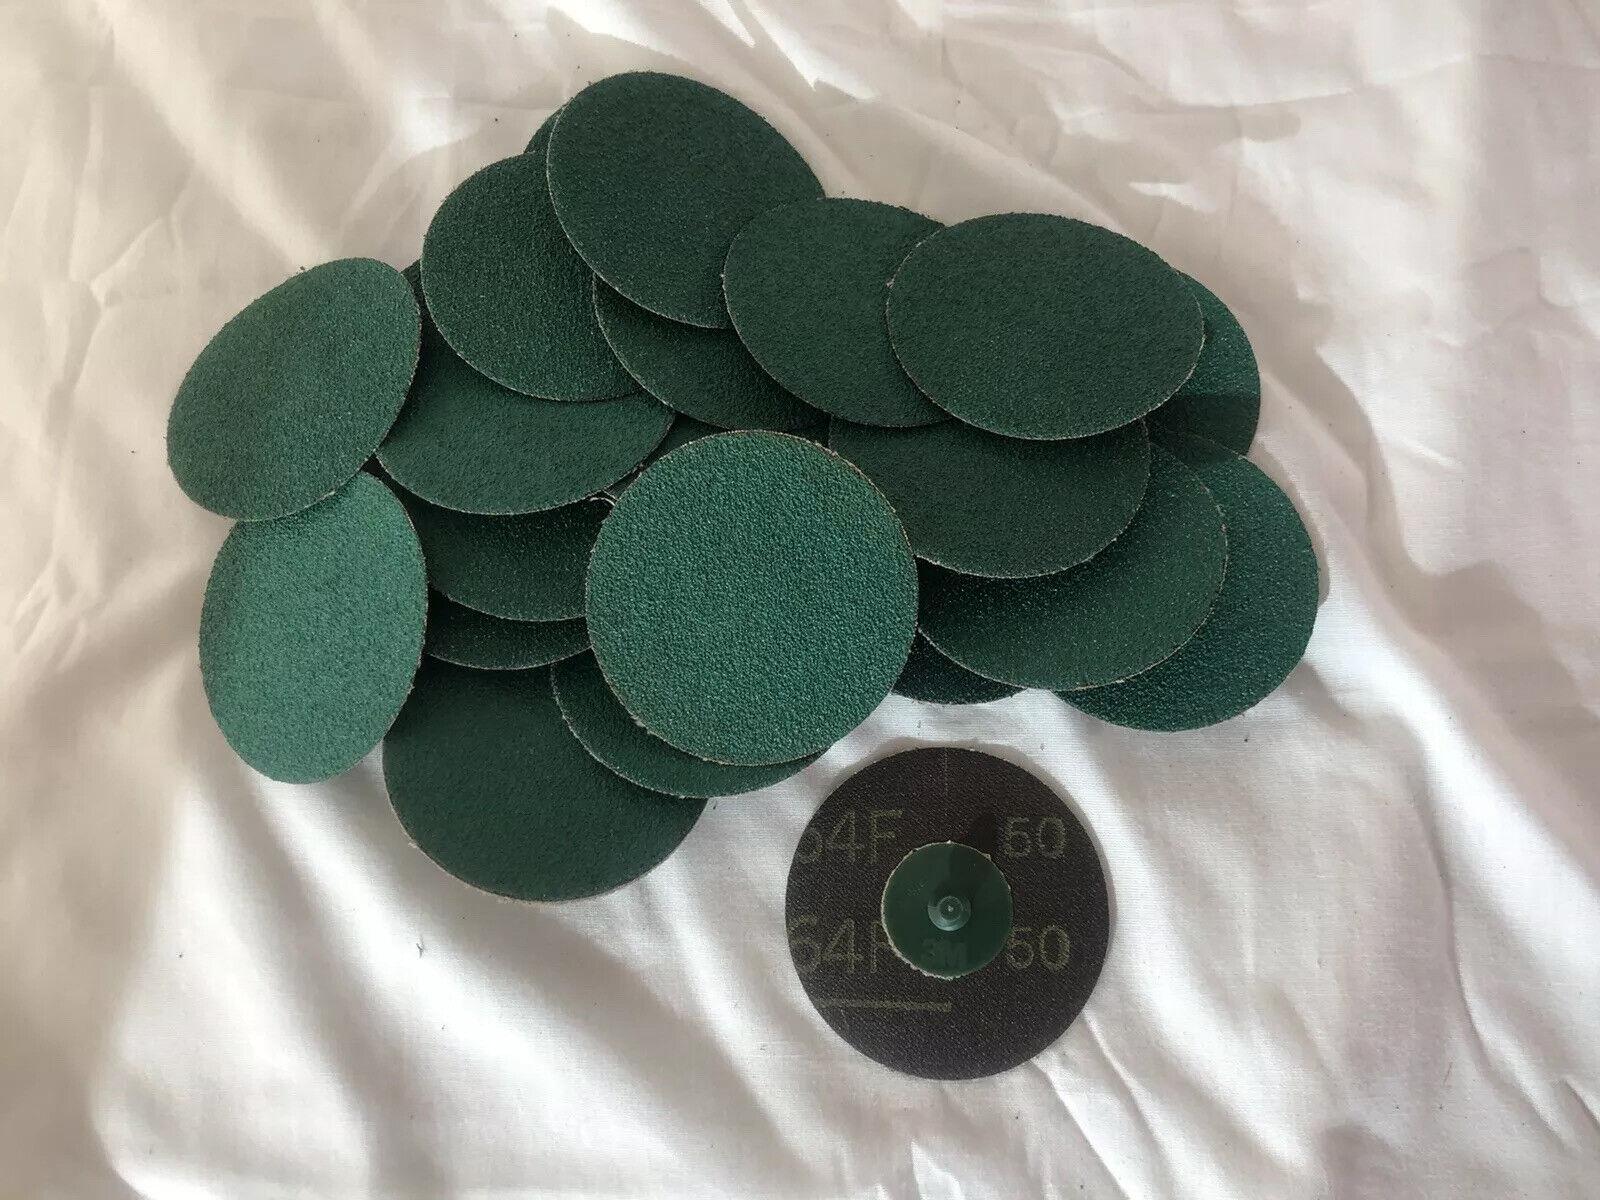 3M™ 01406 Green Corps™ Roloc™ Disc 3M 1406 3 inch 25 discs per box 50YF Grit